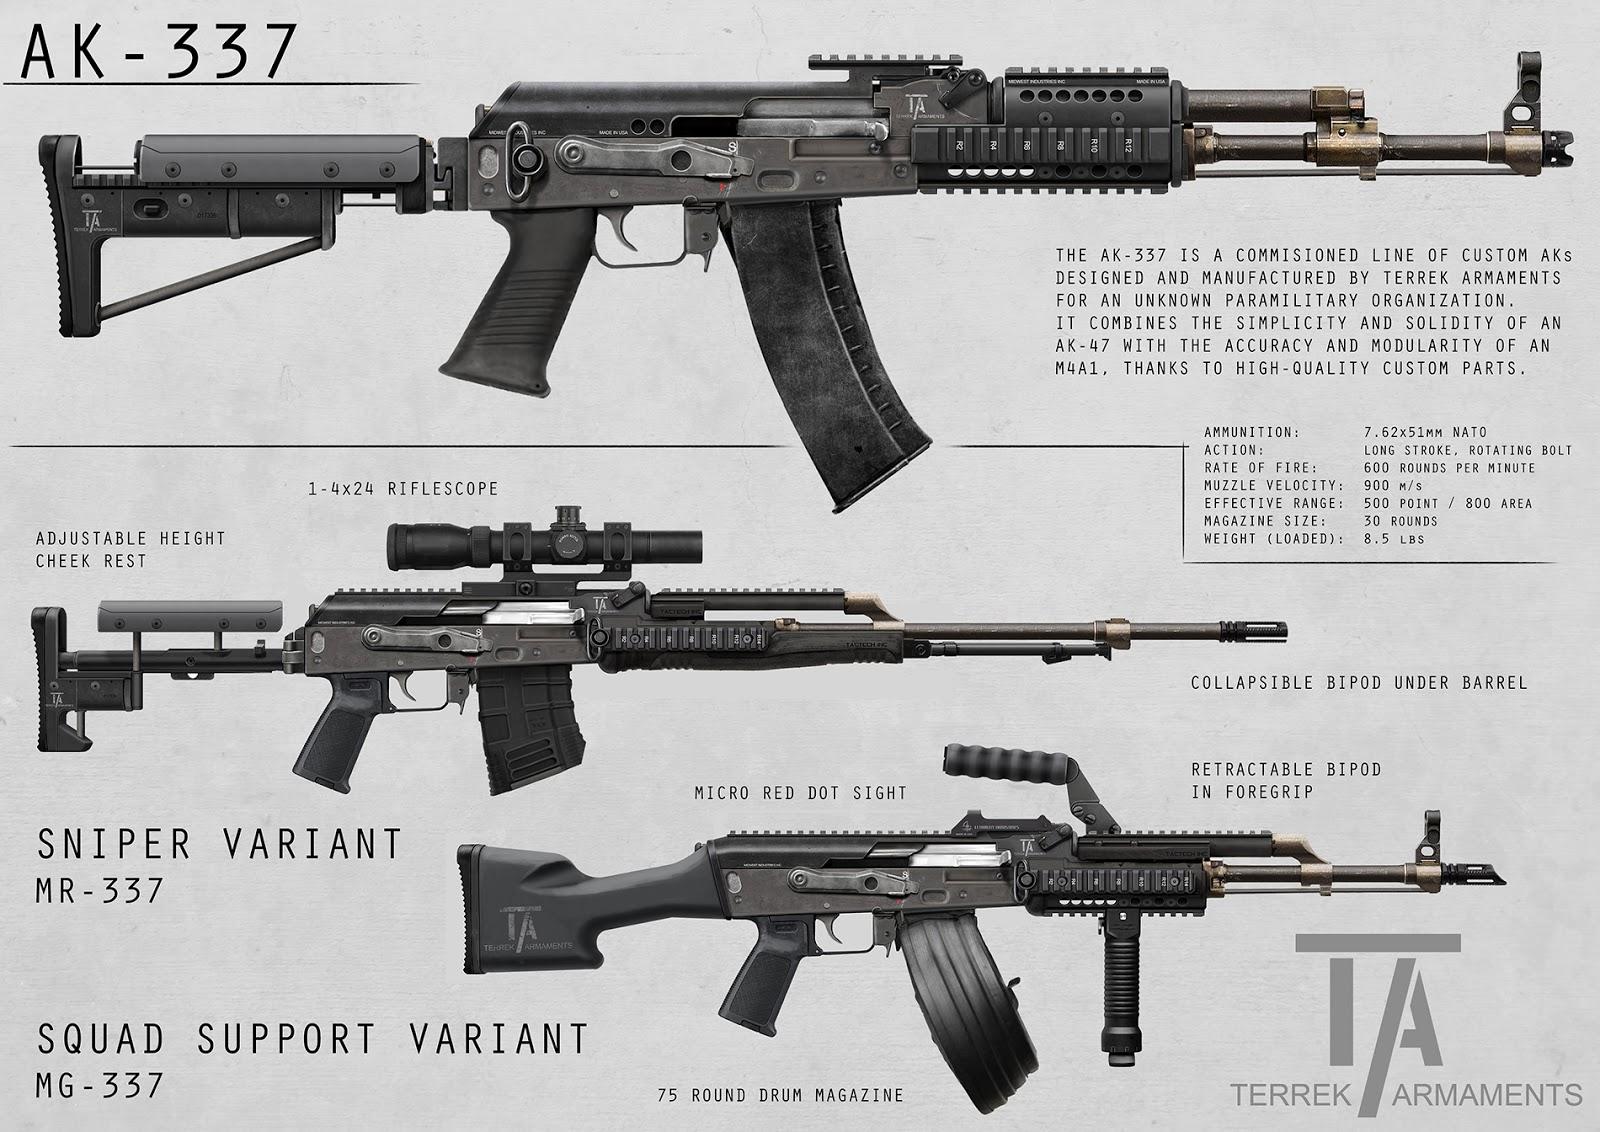 AK337